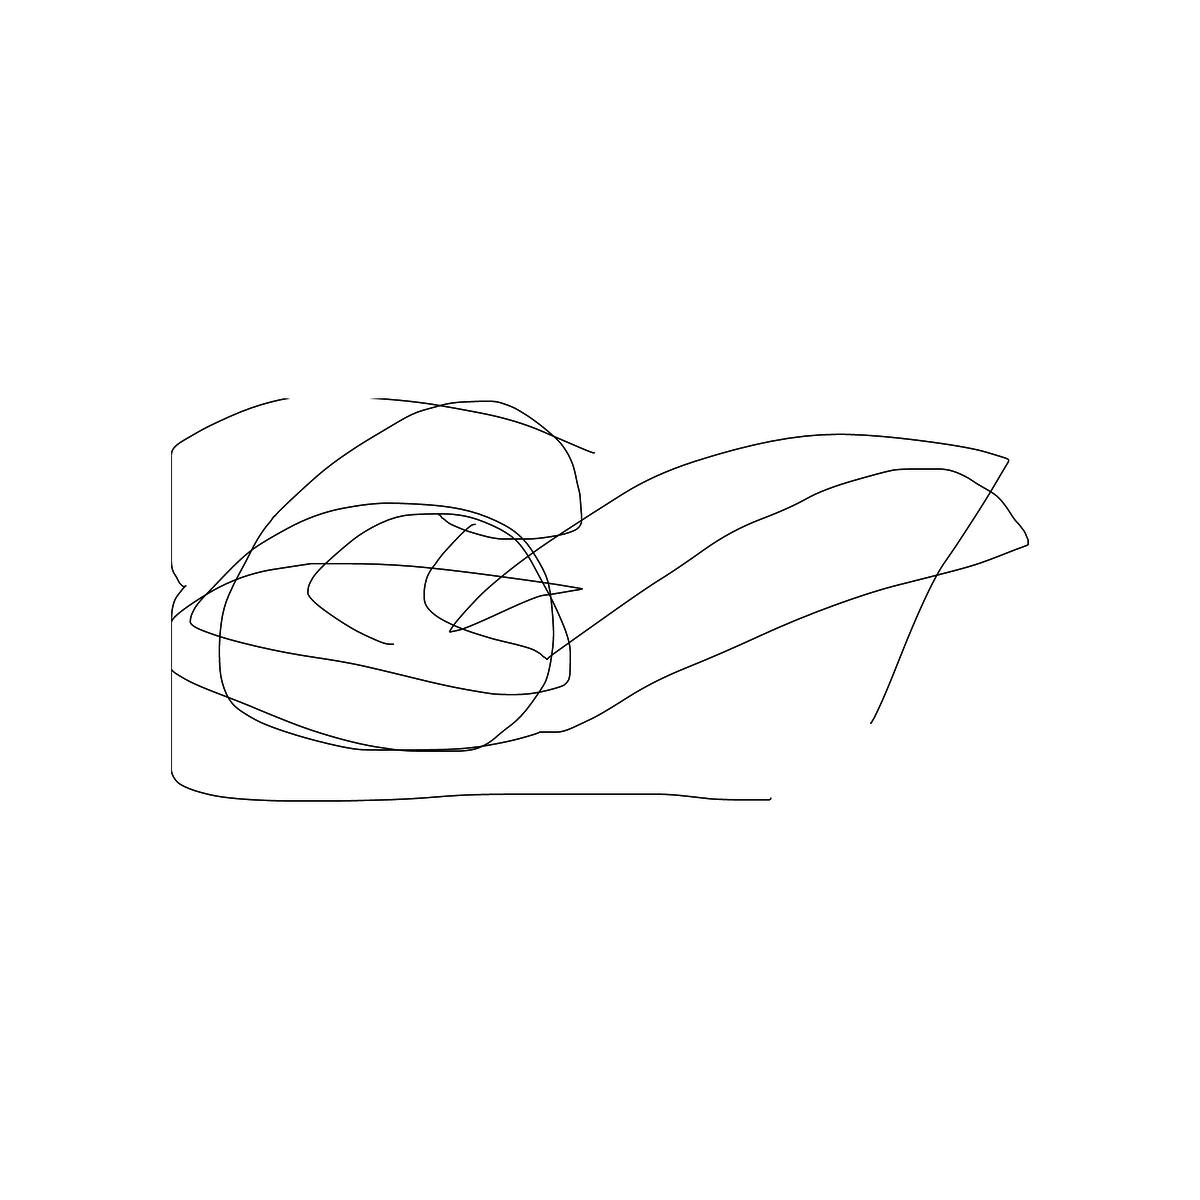 BAAAM drawing#266 lat:32.8562927246093750lng: -116.9806671142578100